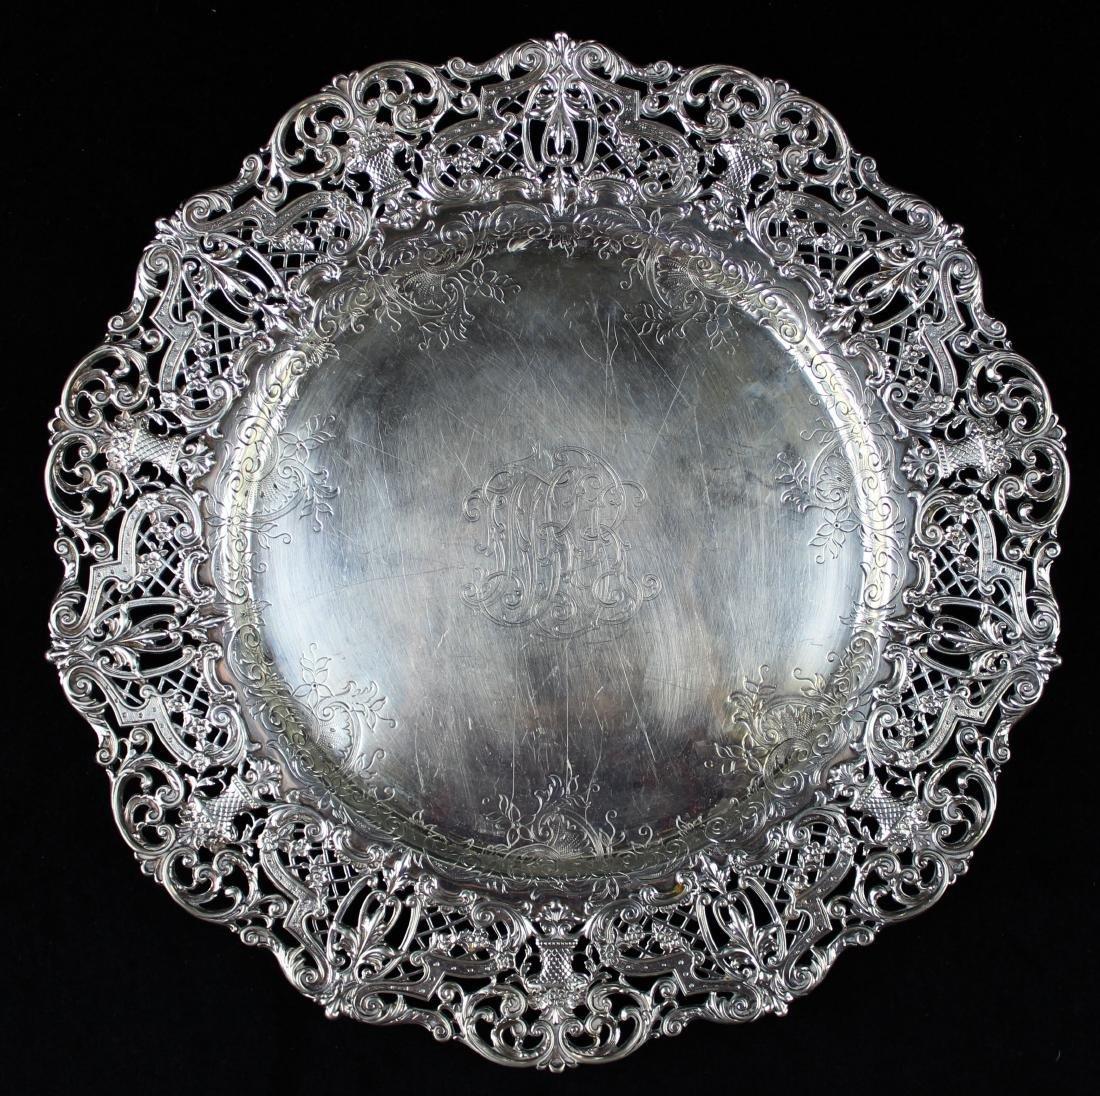 ornate Gorham sterling silver reticulated platter - 8